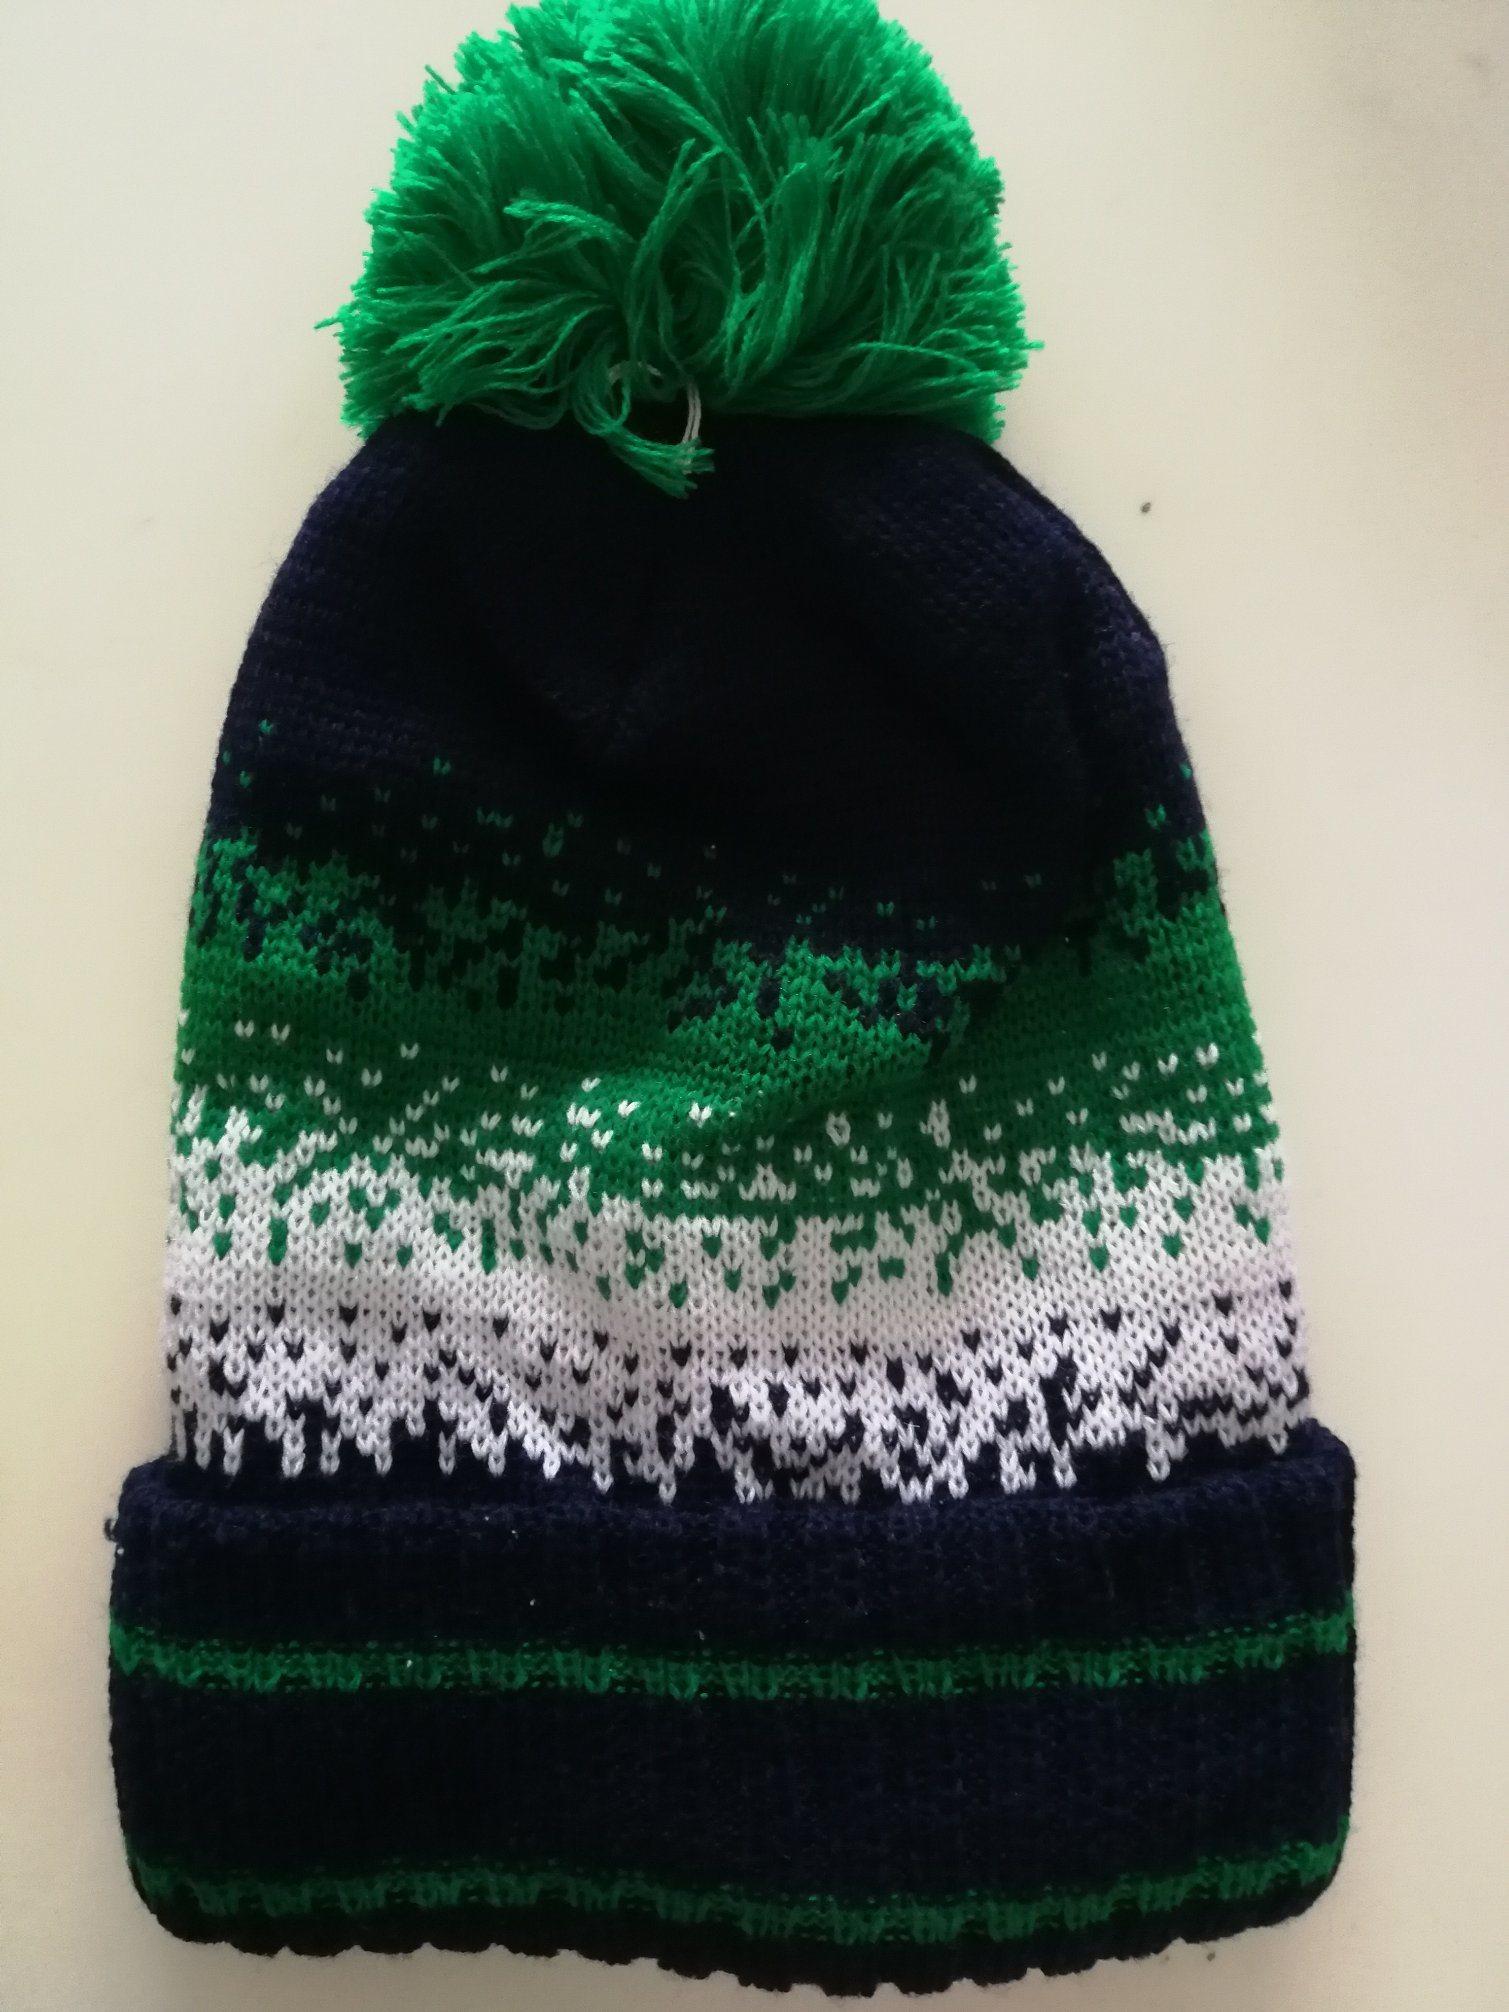 d7dbf5d200f China Green Beanie Hat Winter Warm Hats Knit Slouchy Skull Cap - China Team  Hat